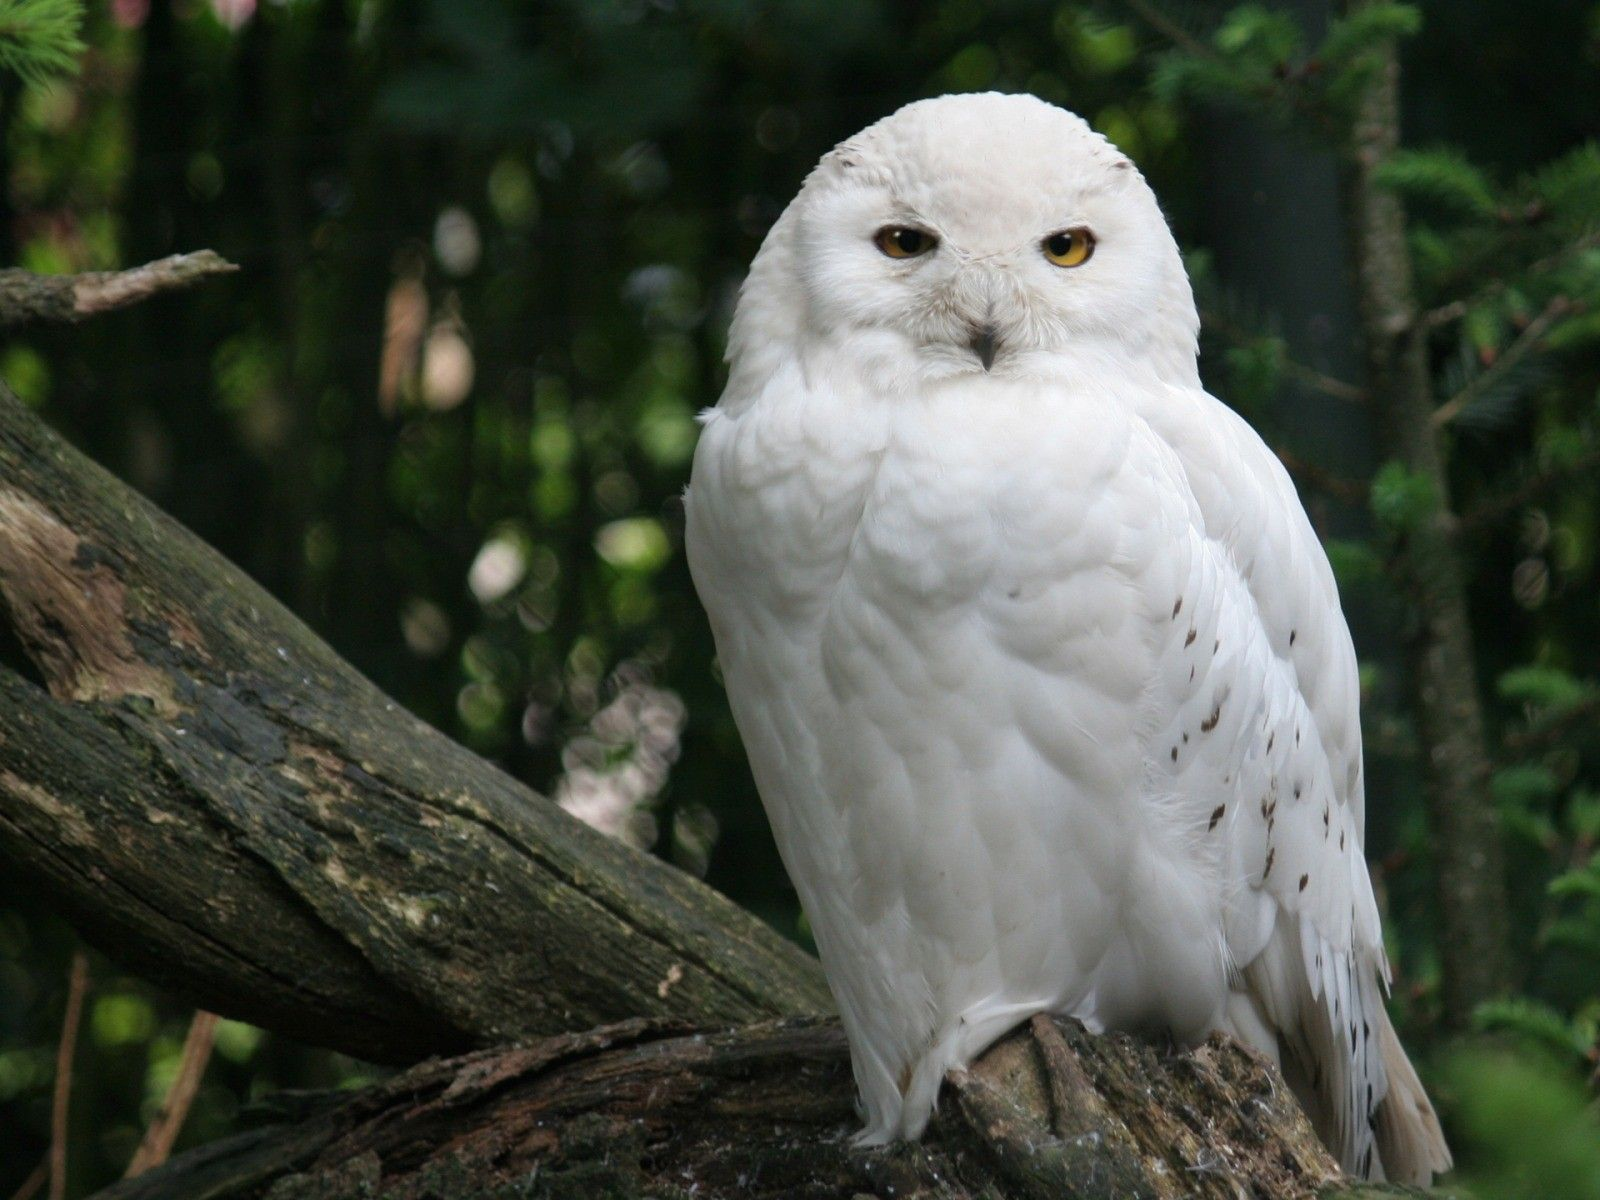 White owl 動物, シロフクロウ, 動物の壁紙